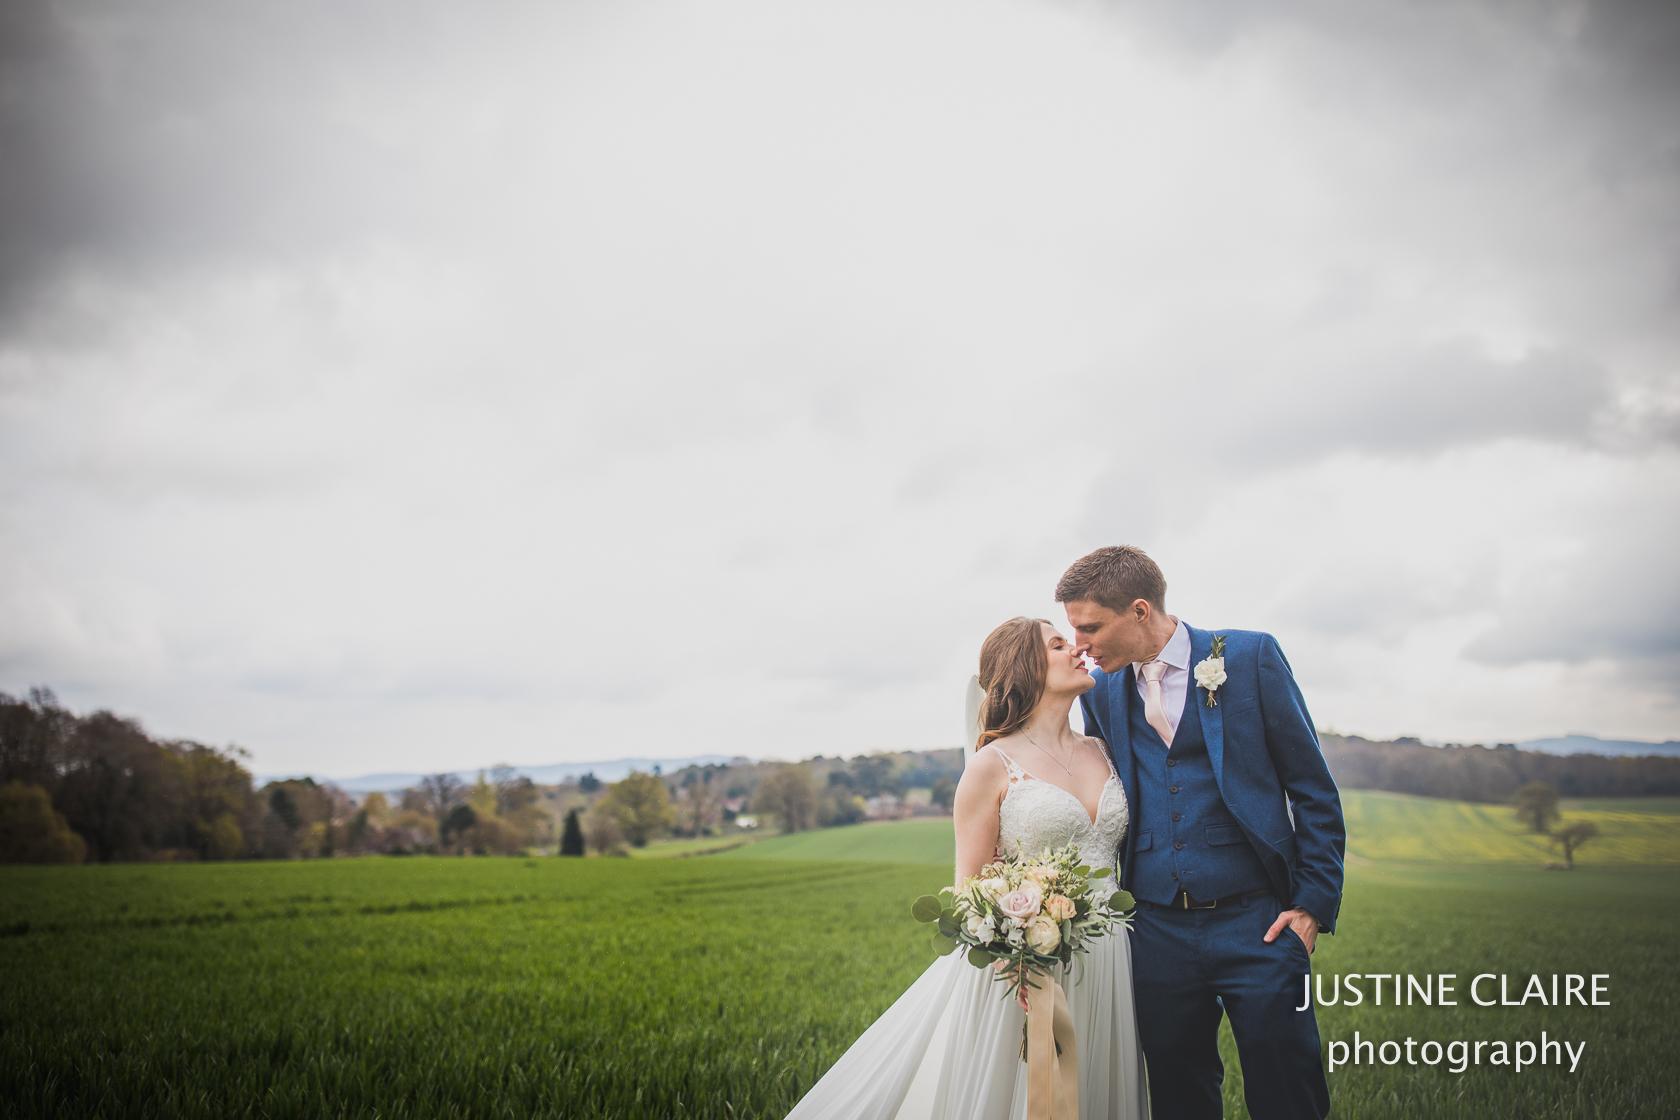 Fitzleroi Fittleworth petworth Billingshurst farm Wedding Photography by Justine Claire photographer Arundel Worthing Brighton-48.jpg